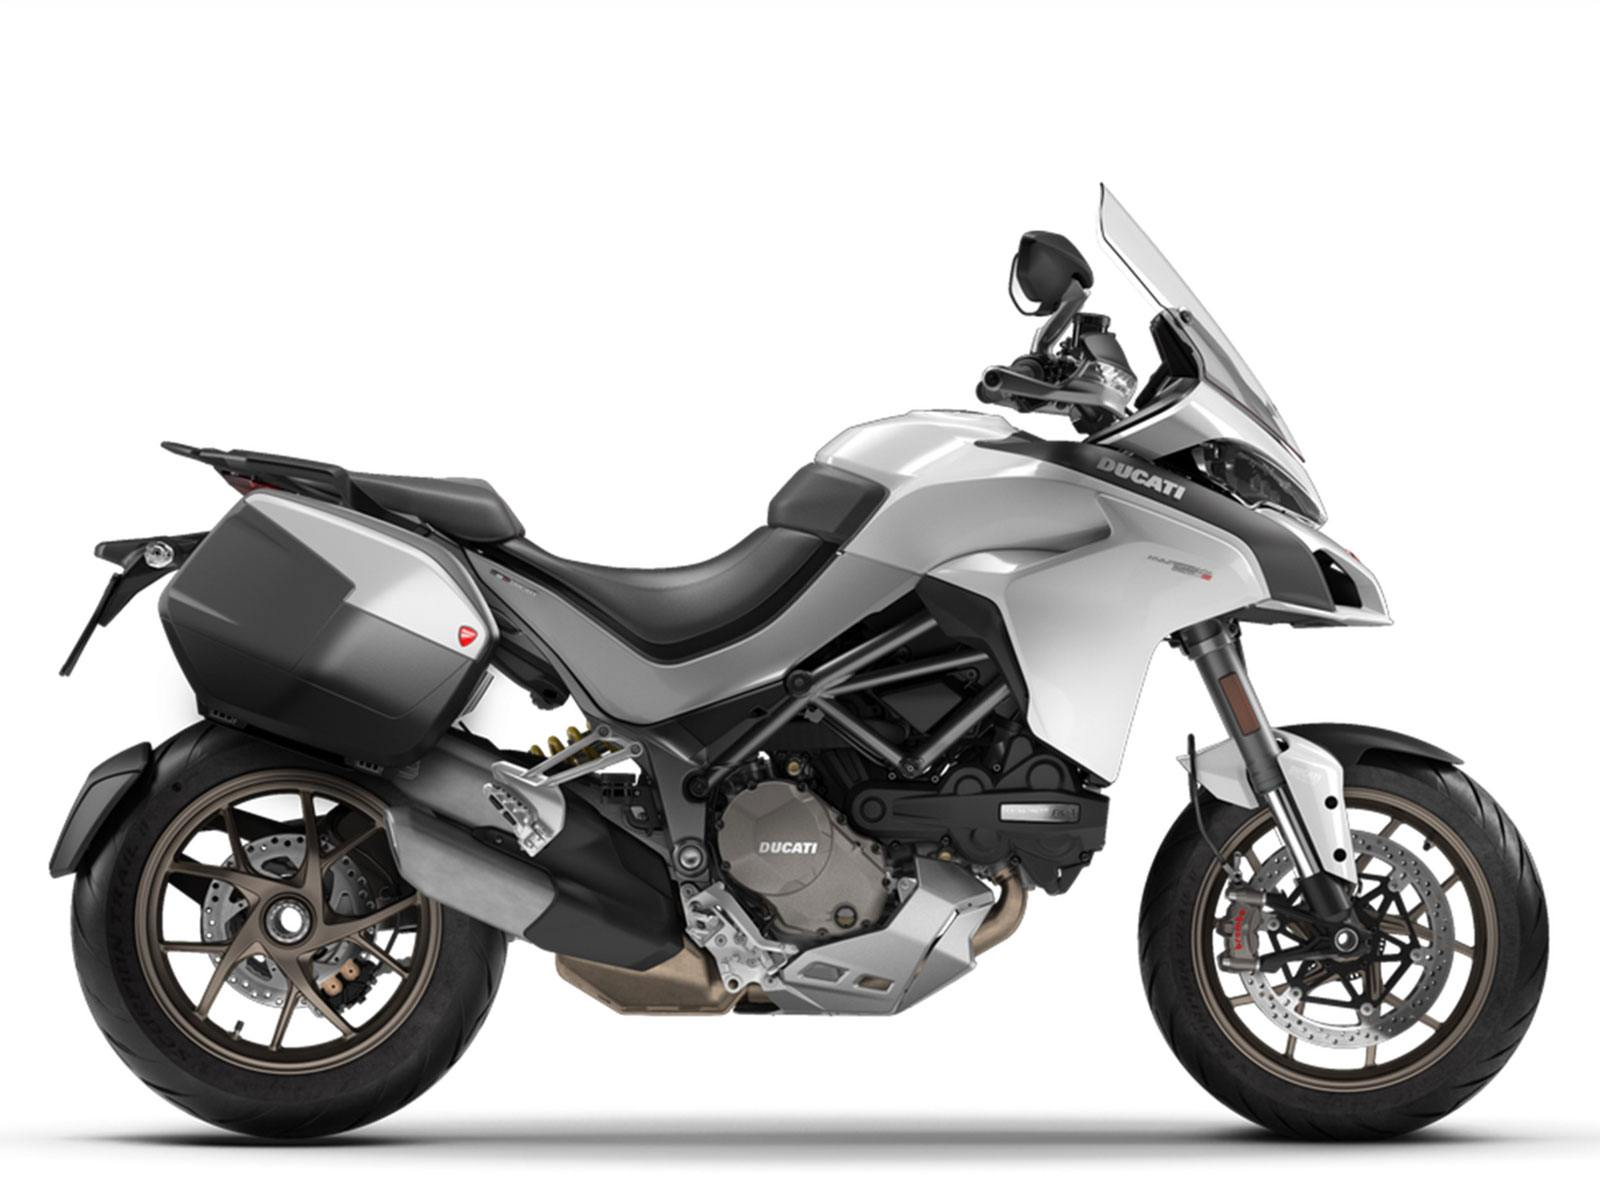 Мотоцикл DUCATI Multistrada 1260 S - Iceberg White + Touring Pack (2019)